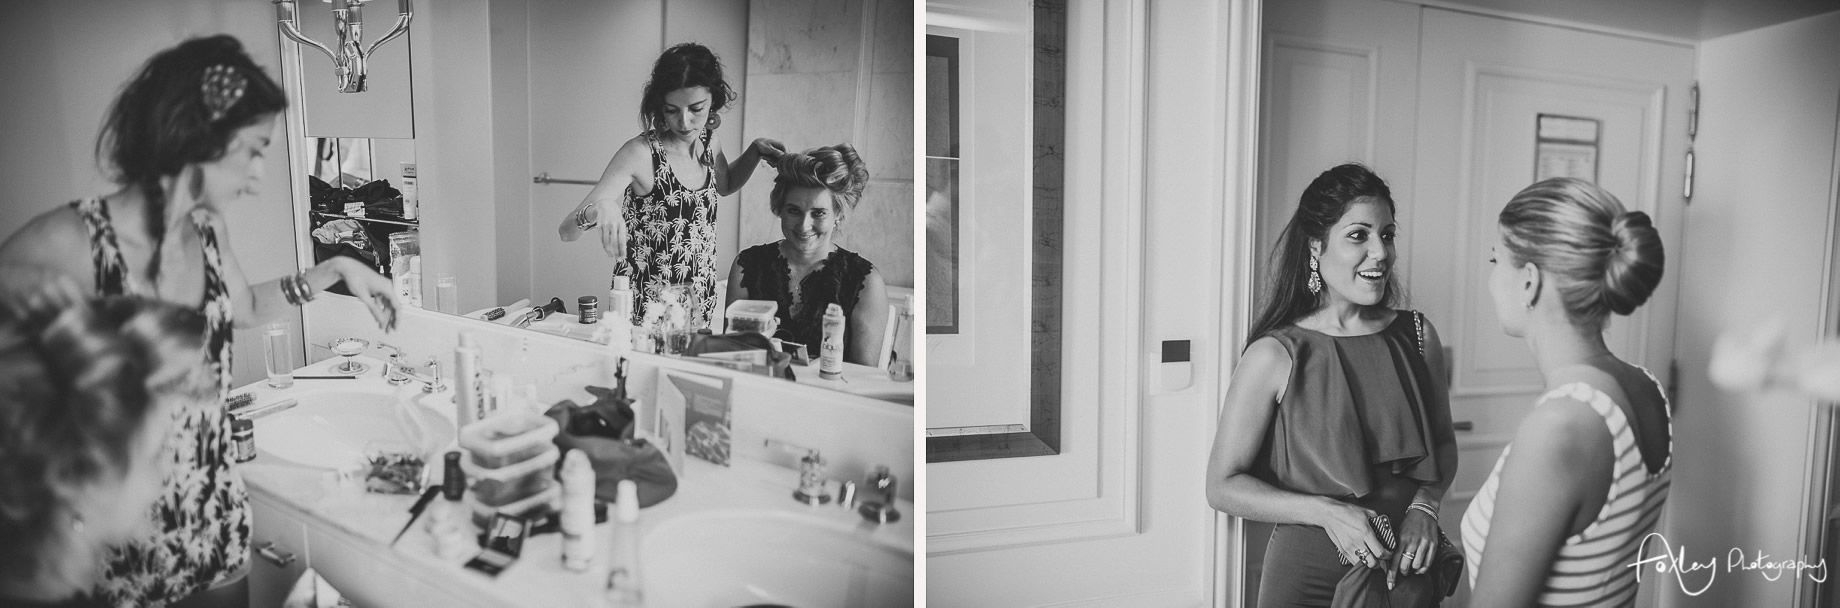 Jil and Will's Wedding at Villa Ephrussi De Rothschild 026